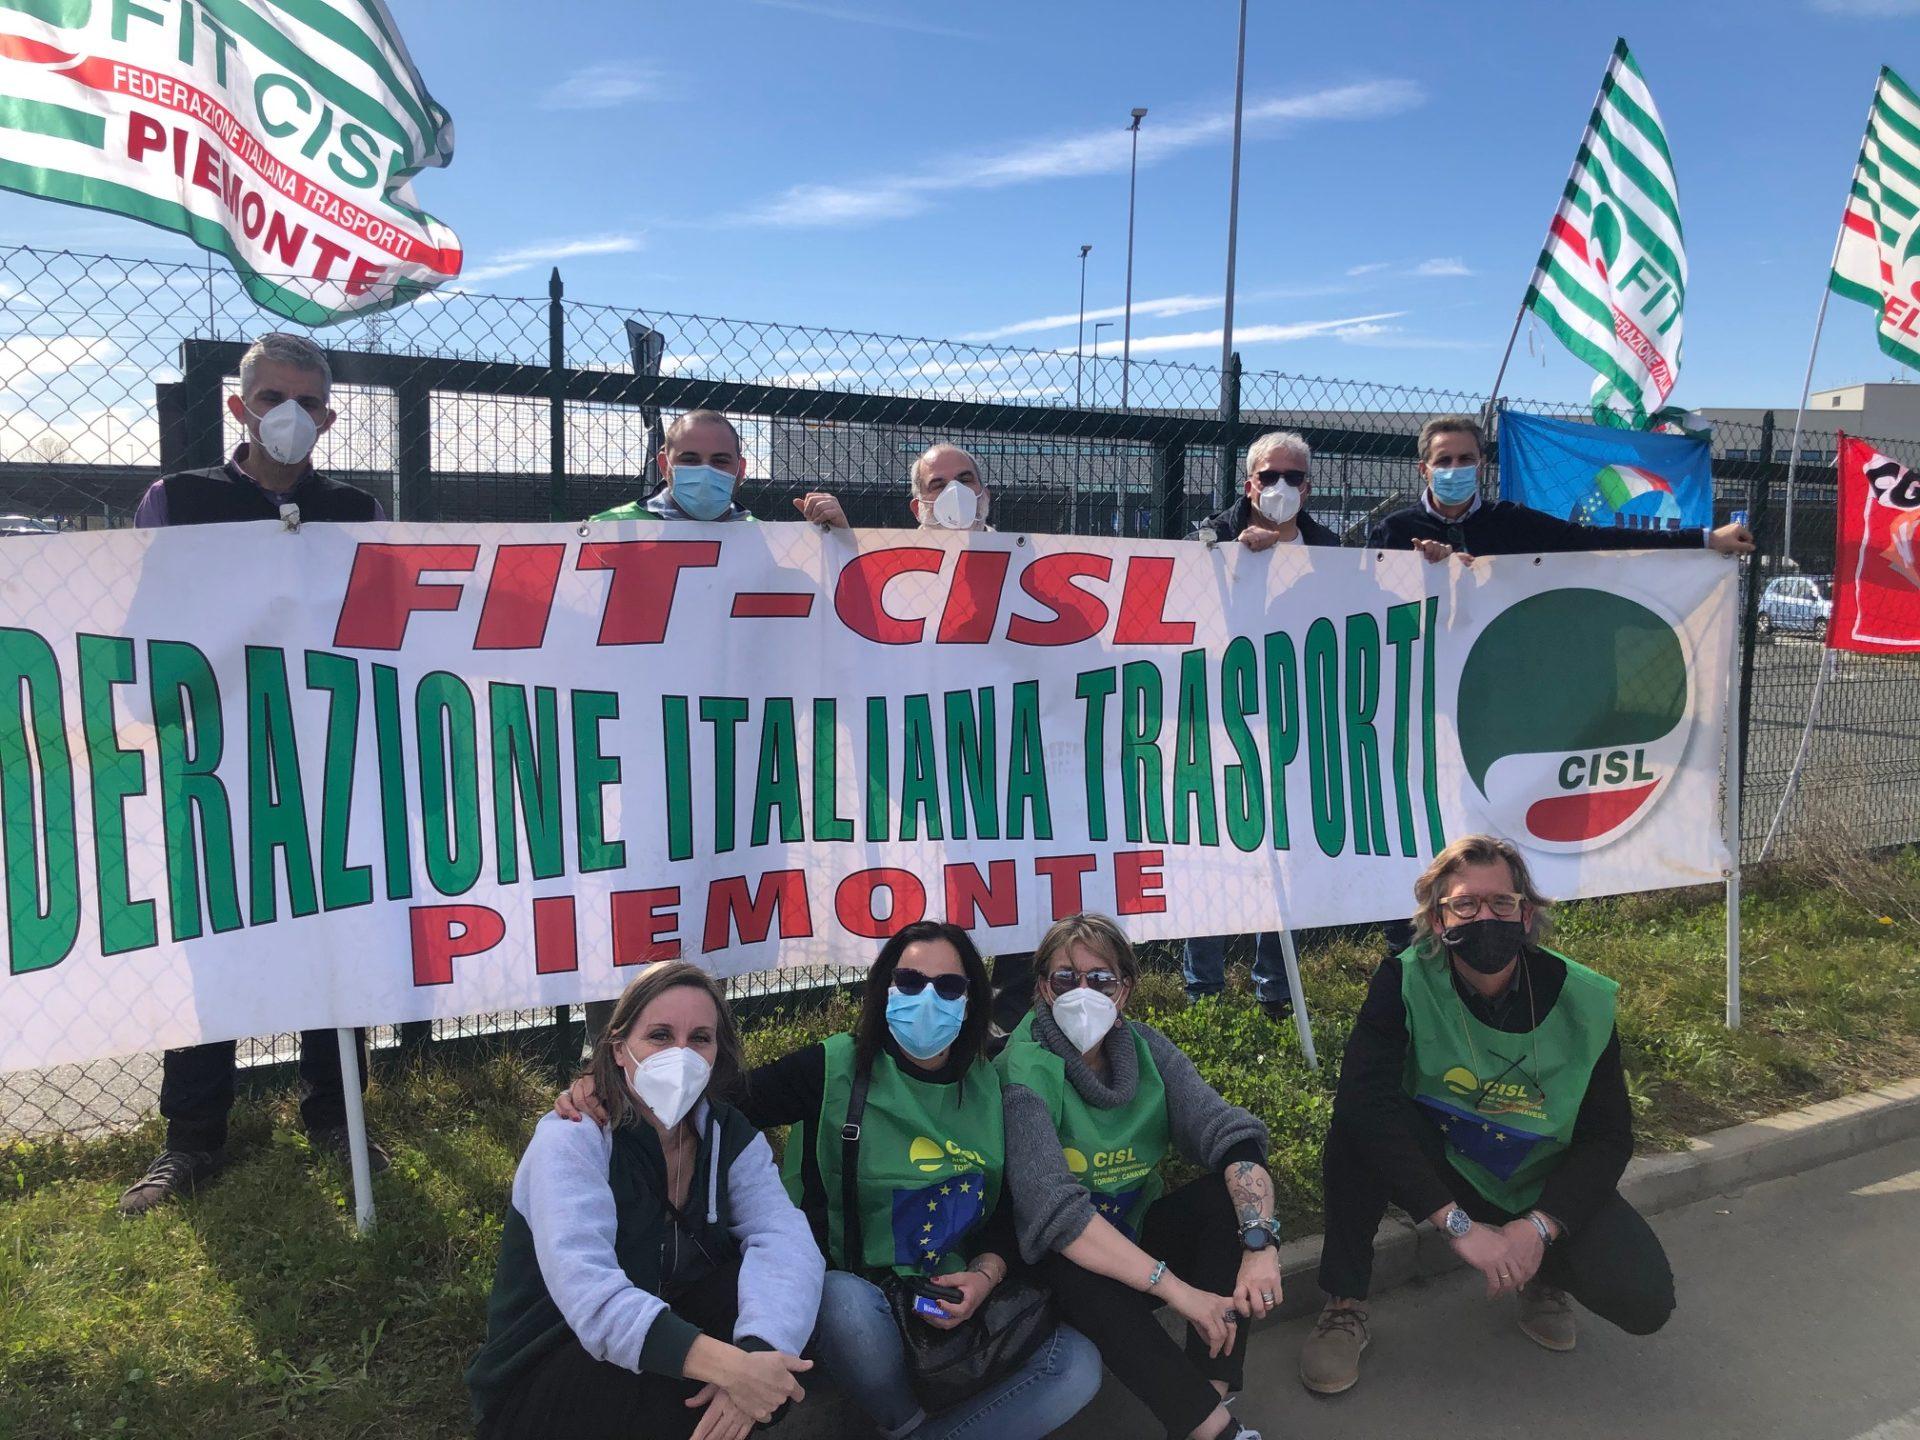 Presidio Amazon Fit Cisl a Torrazza Piemonte